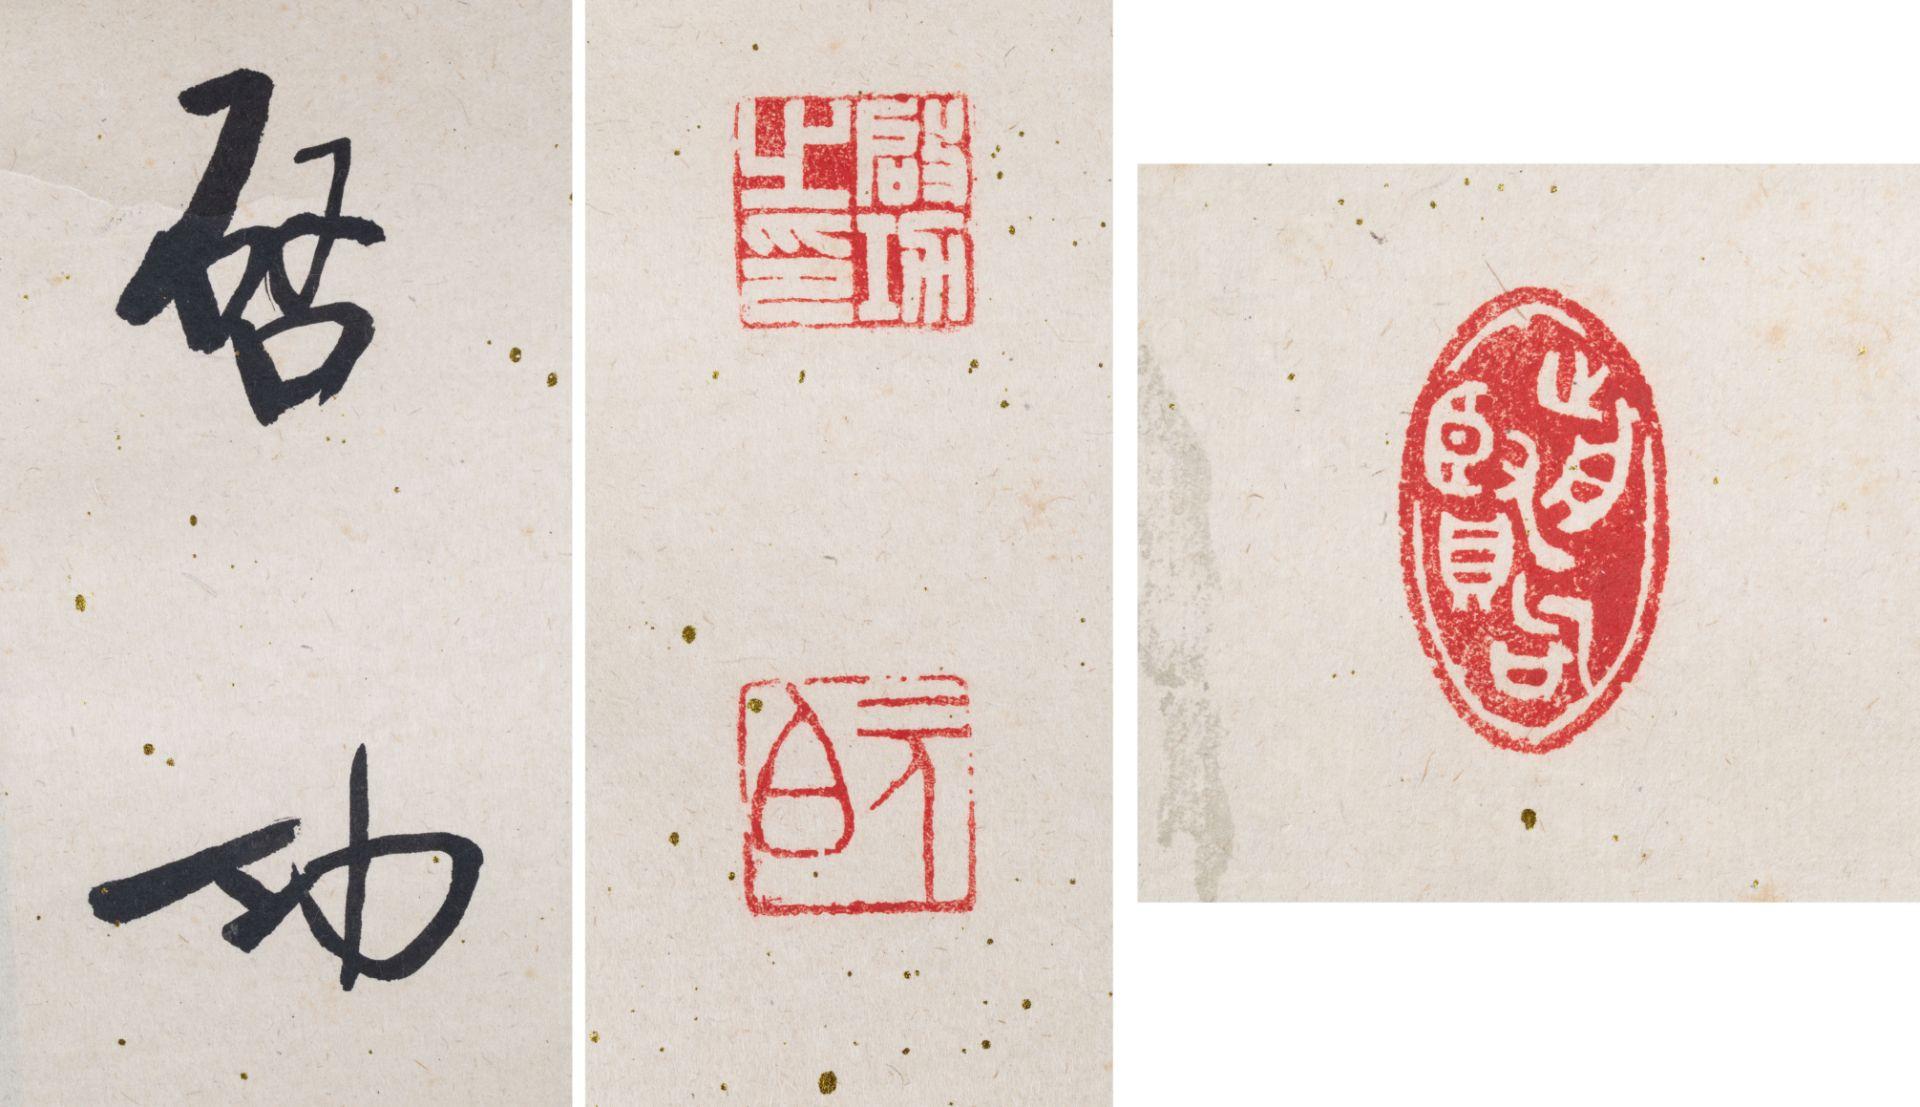 QIGONG (CHINESE 1912-2005) - Image 2 of 2